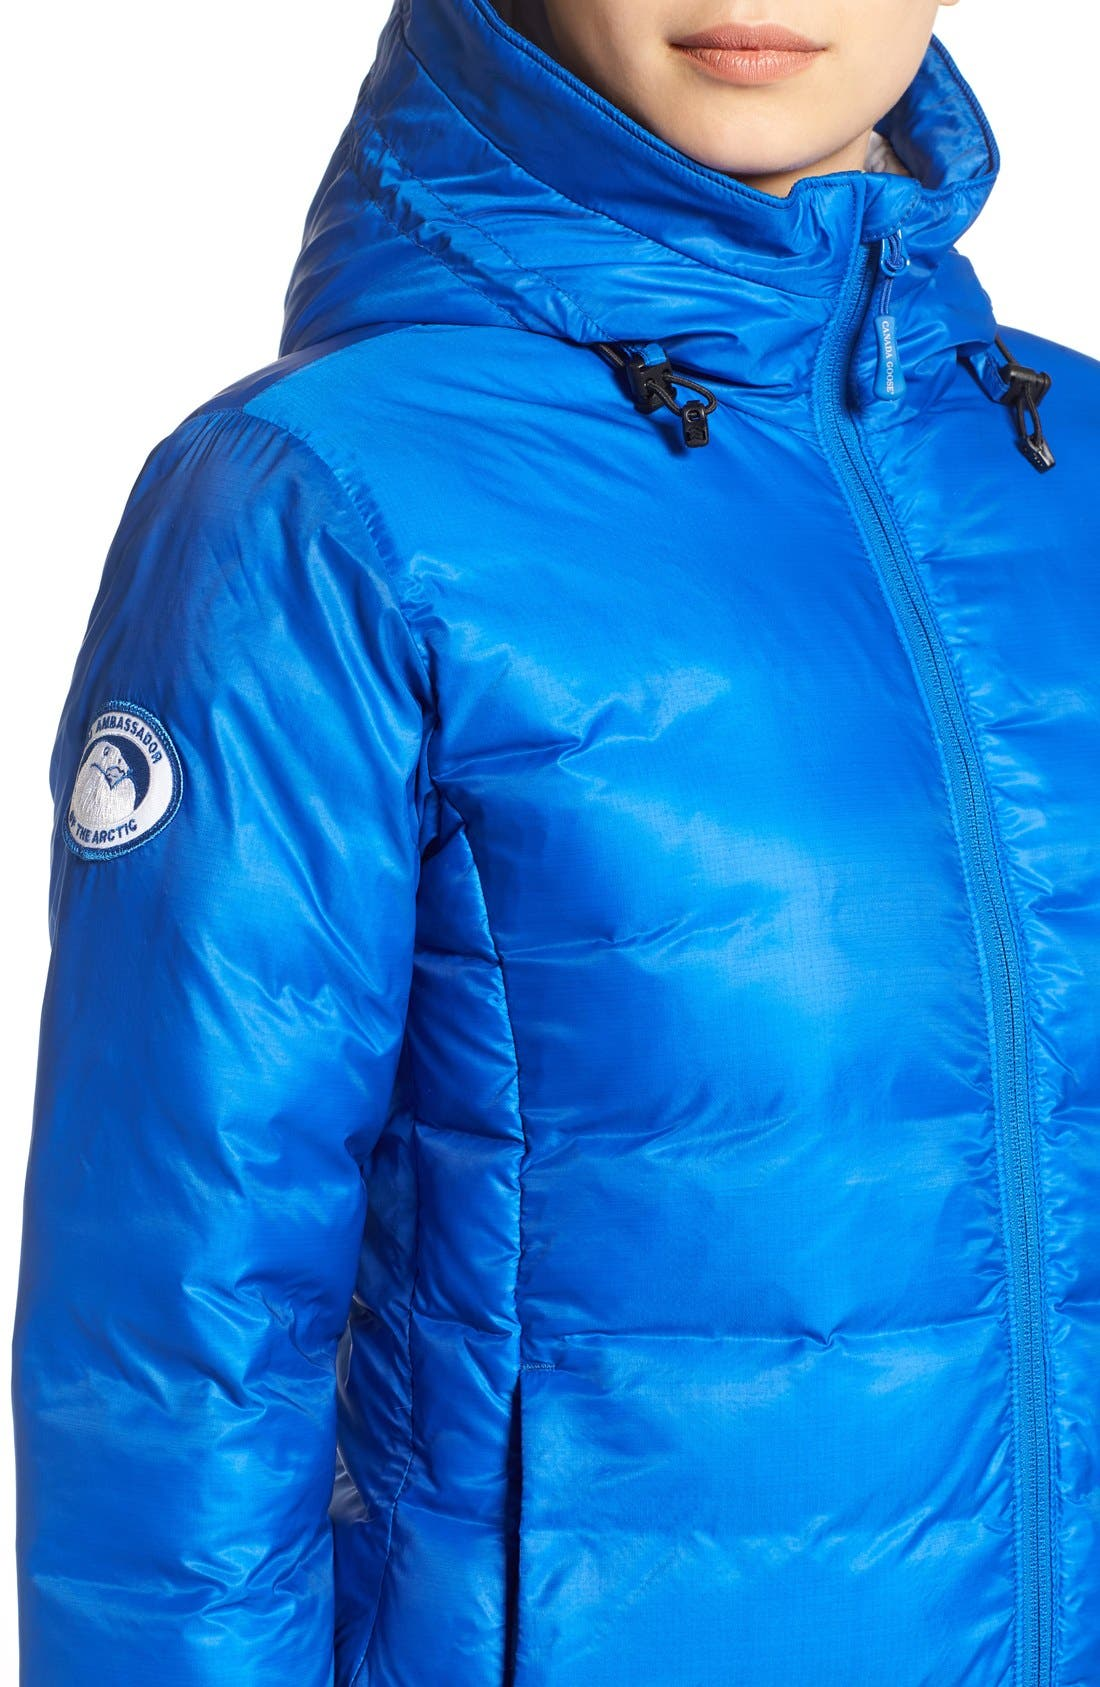 'PBI Camp' Packable Hooded Down Jacket,                             Alternate thumbnail 7, color,                             ROYAL PBI BLUE